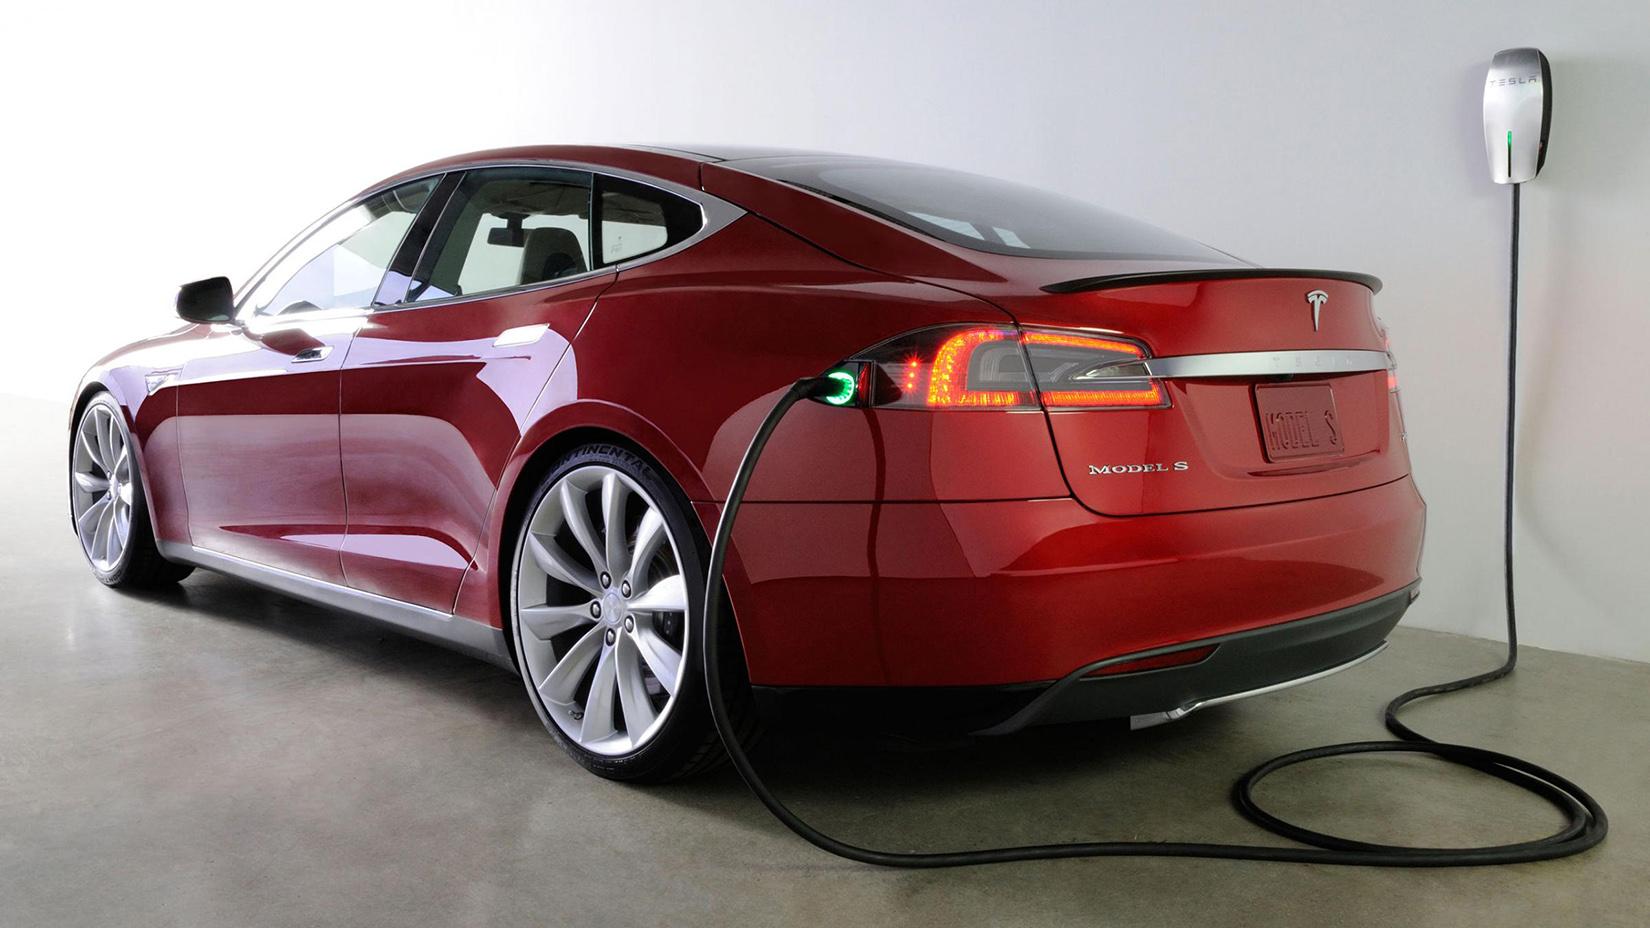 A red Model S sedan charging inside a garage bay.